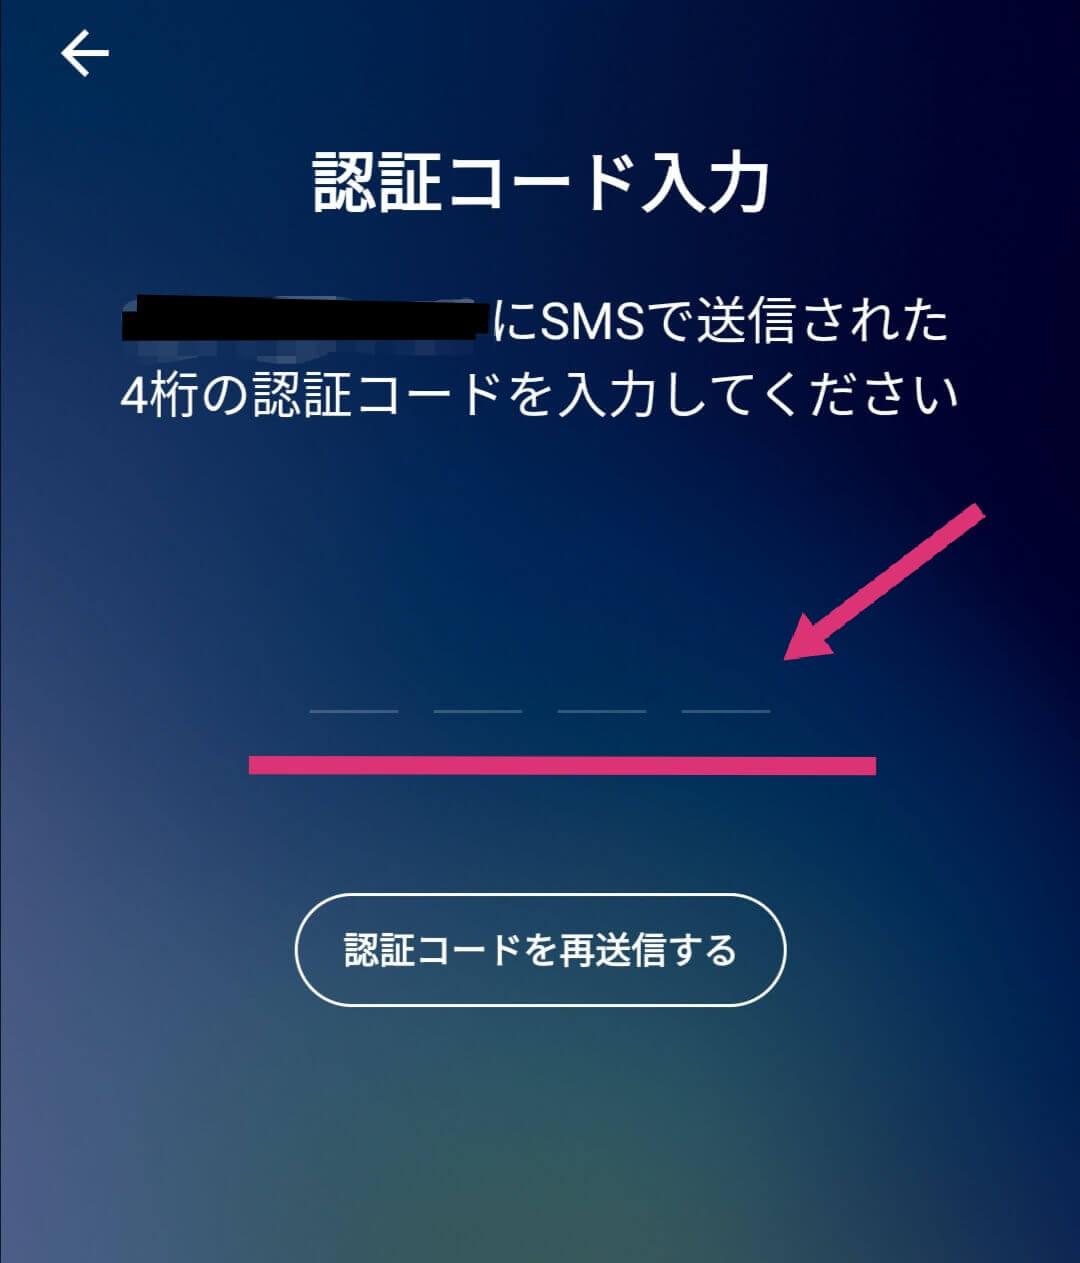 GOタクシーアプリのクーポンコード使い方・適用方法5